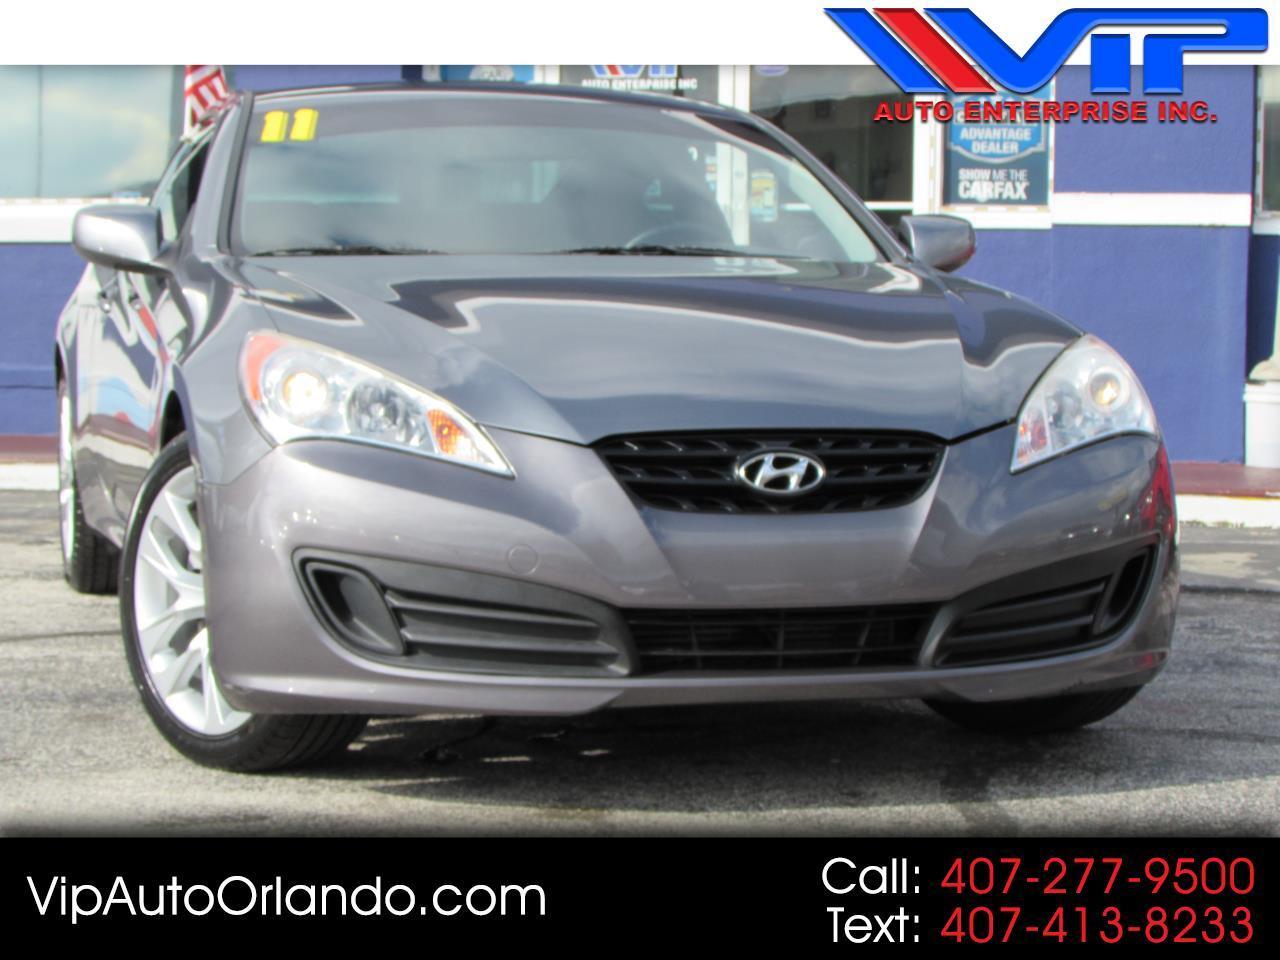 2011 Hyundai Genesis Coupe 2dr 2.0T R-spec Man